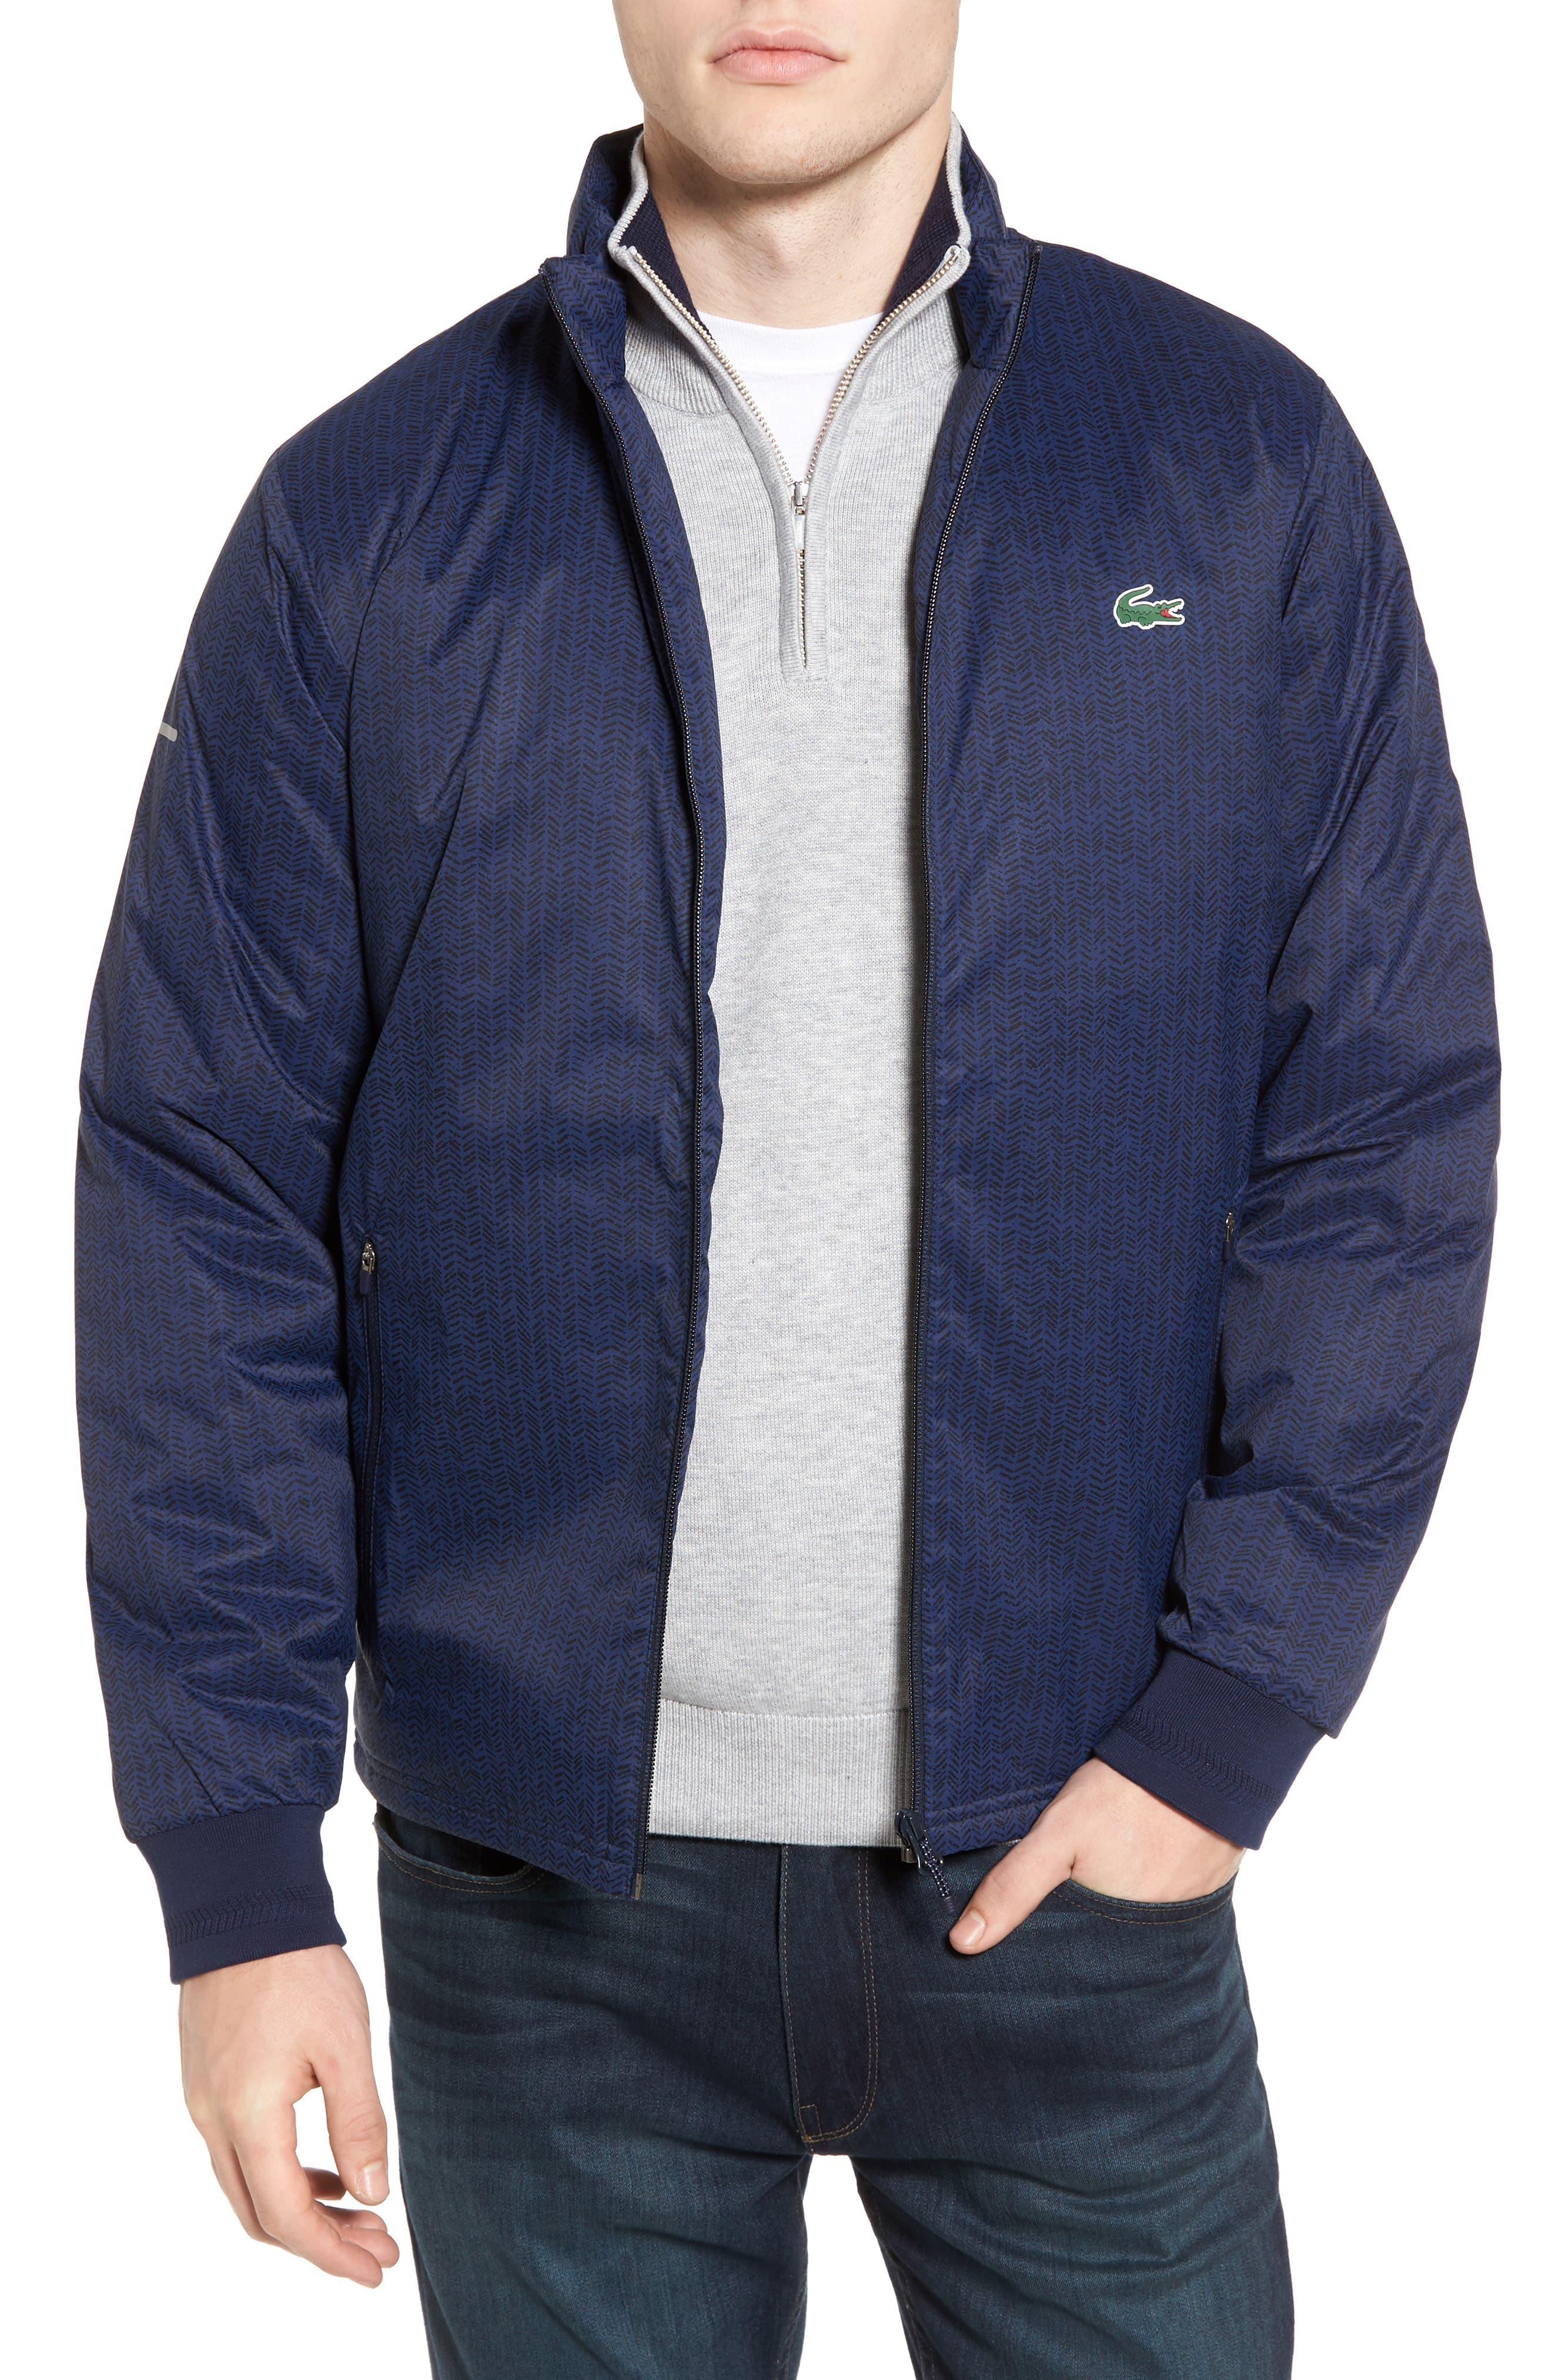 Main Image - Lacoste Herringbone Zip-Up Jacket